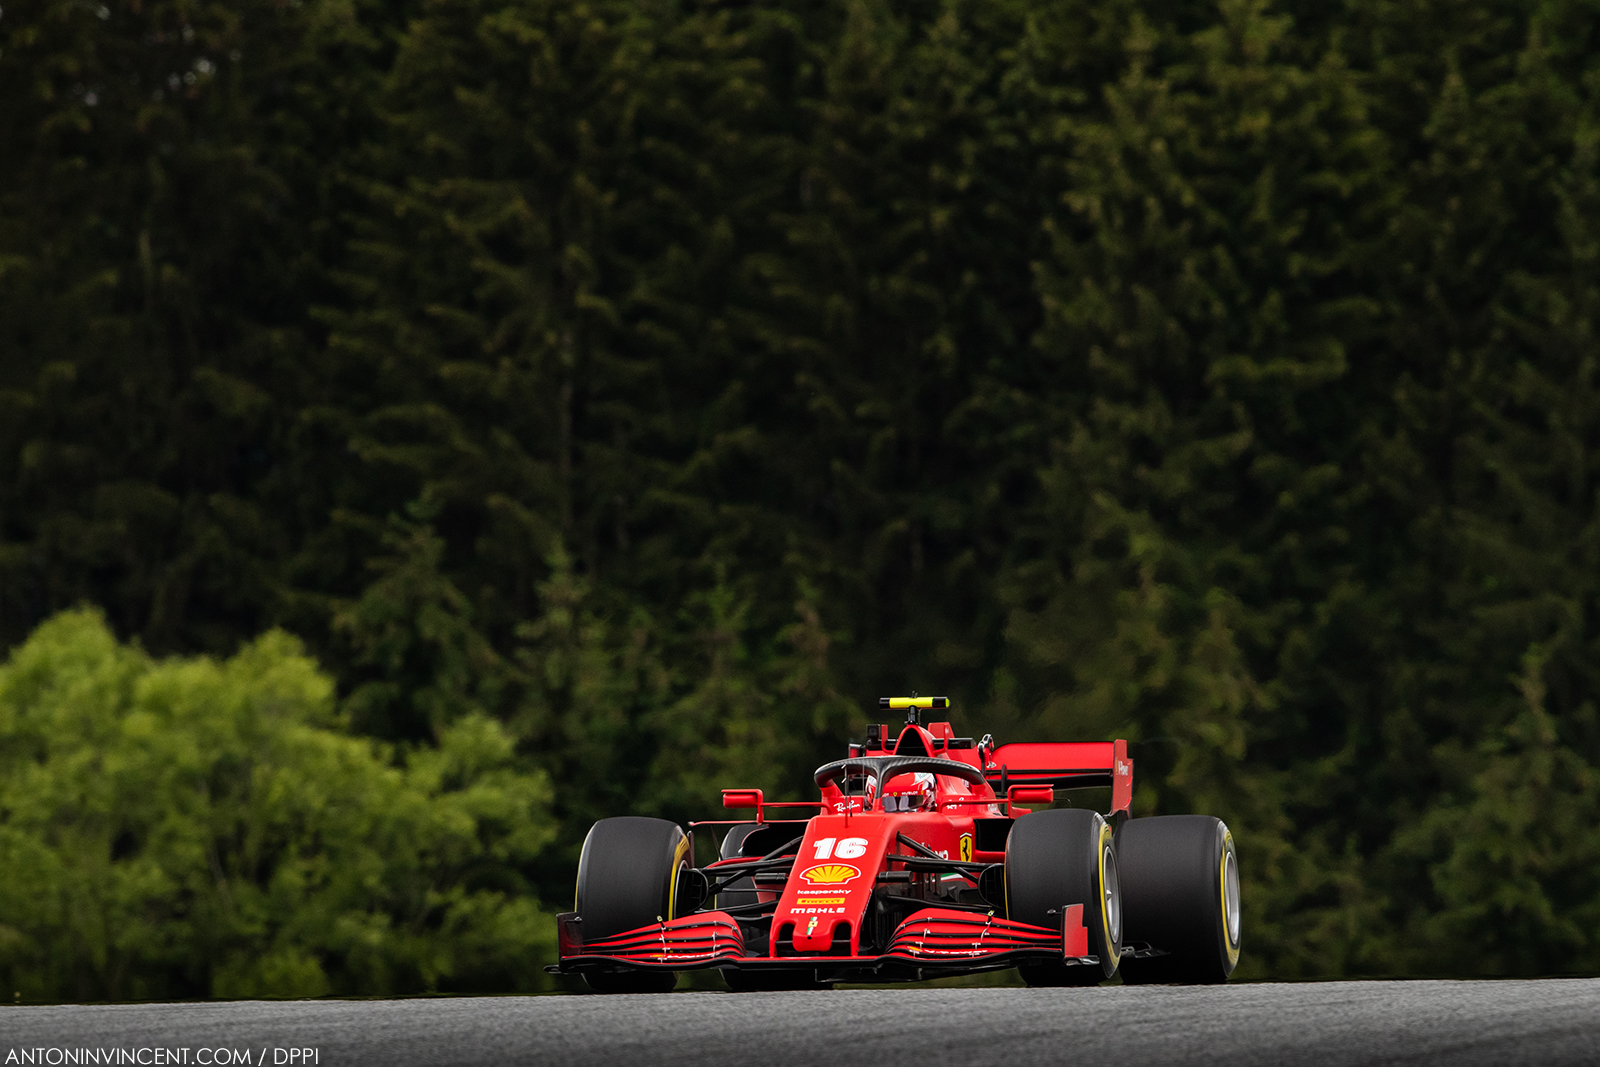 F1 – AUSTRIAN GRAND PRIX 2020